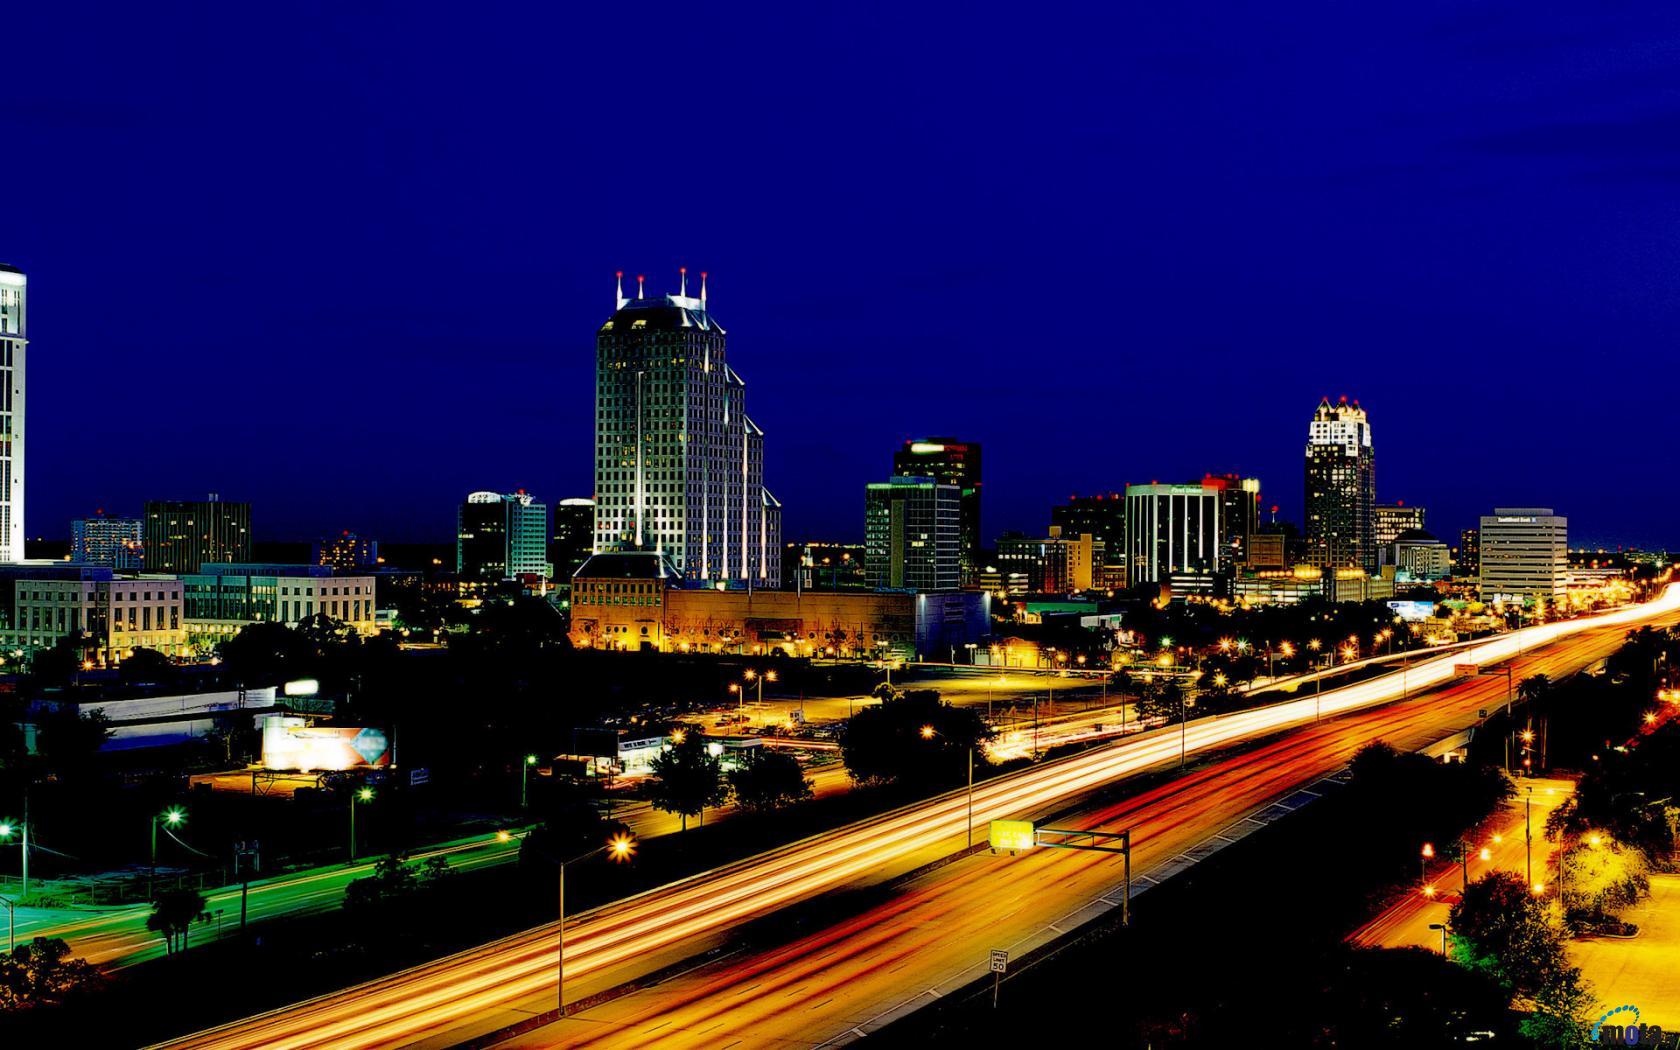 Download Wallpaper Orlando by night Florida 1680 x 1050 widescreen 1680x1050